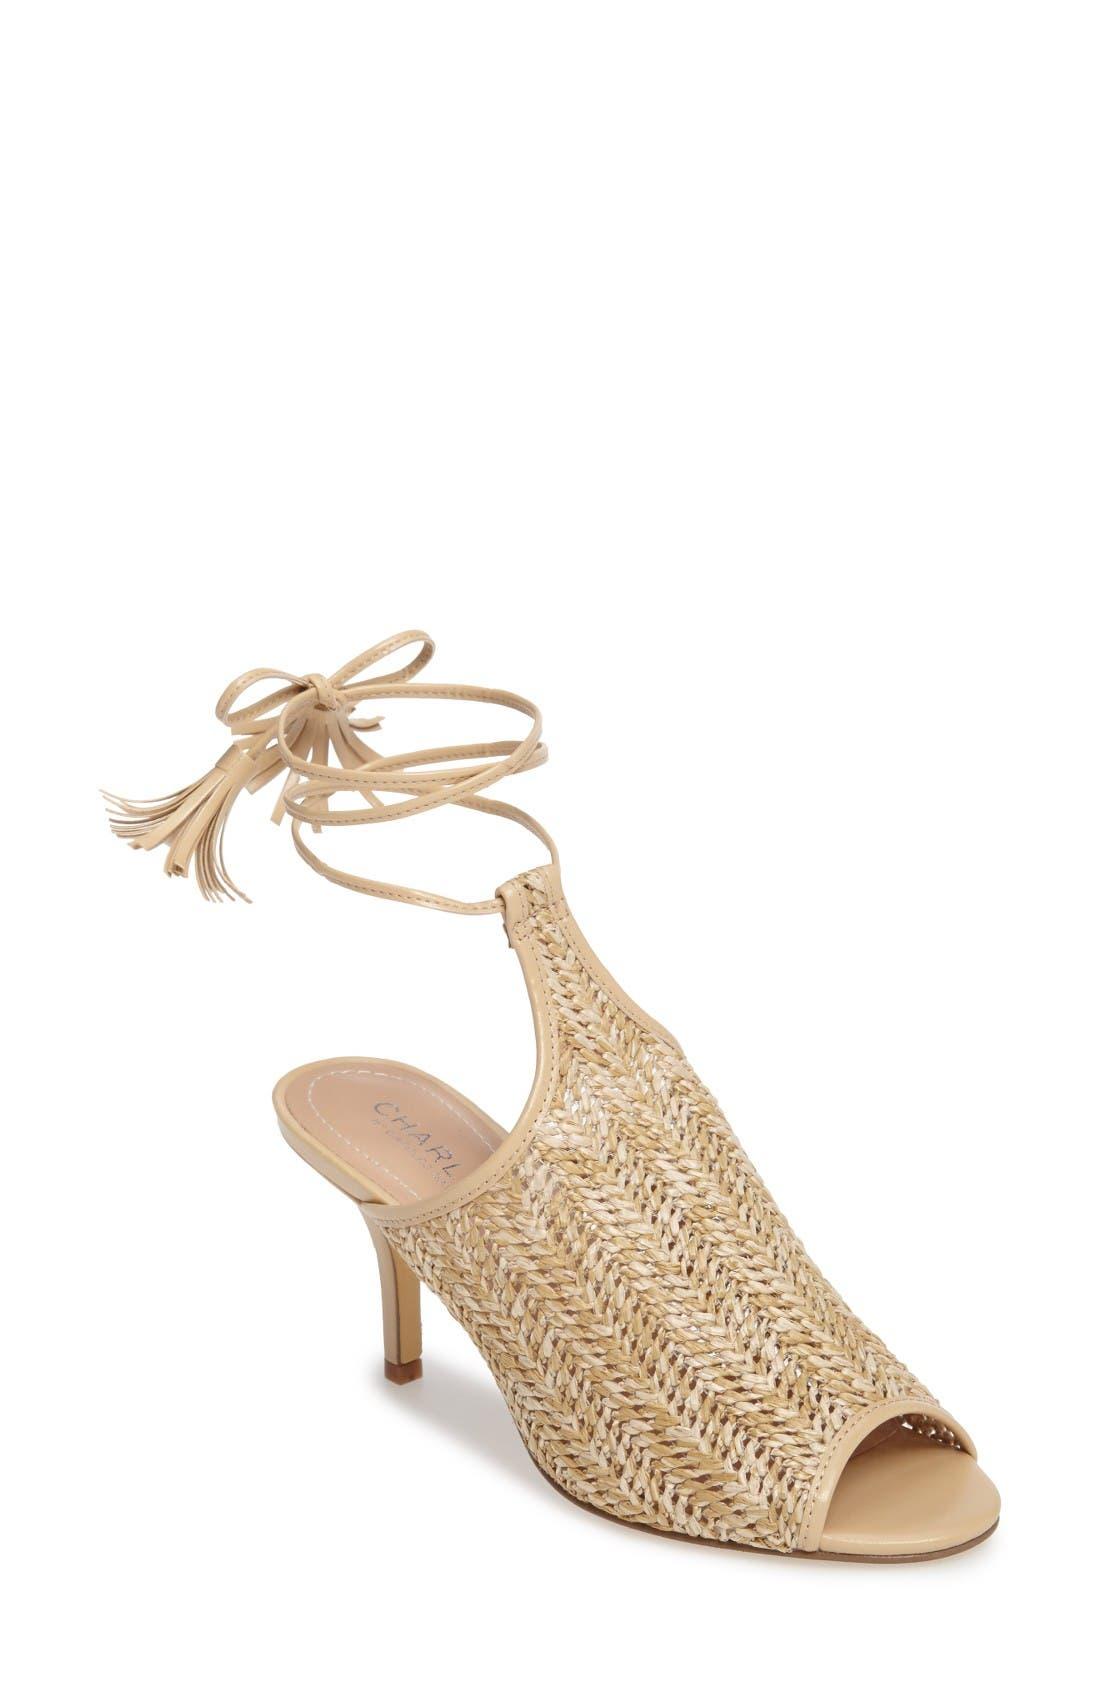 Alternate Image 1 Selected - Charles by Charles David Niko Ankle Tie Sandal (Women)